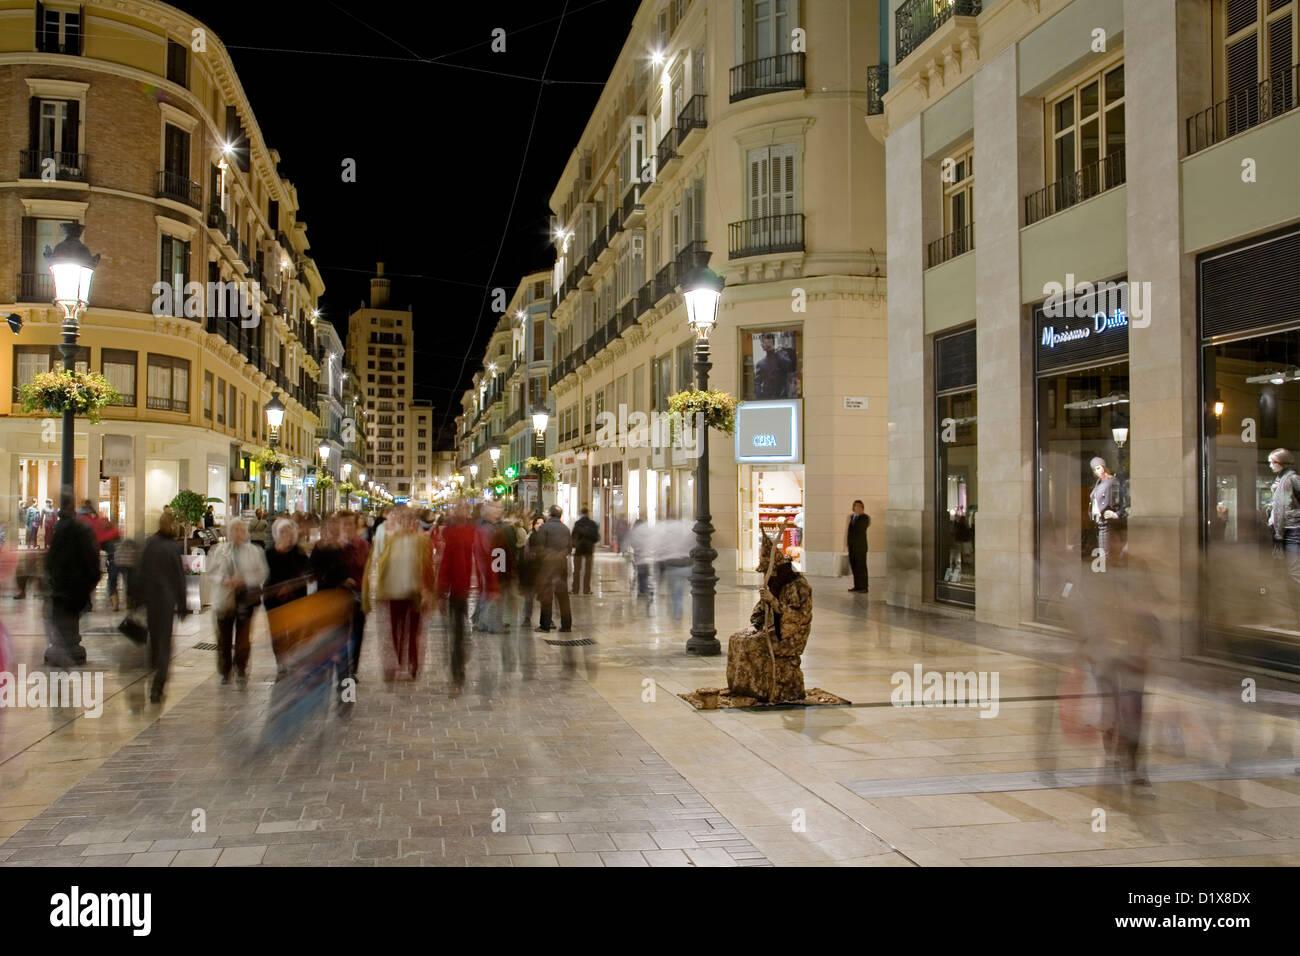 Commercial Area Calle Larios Malaga Andalusia Spain - Stock Image